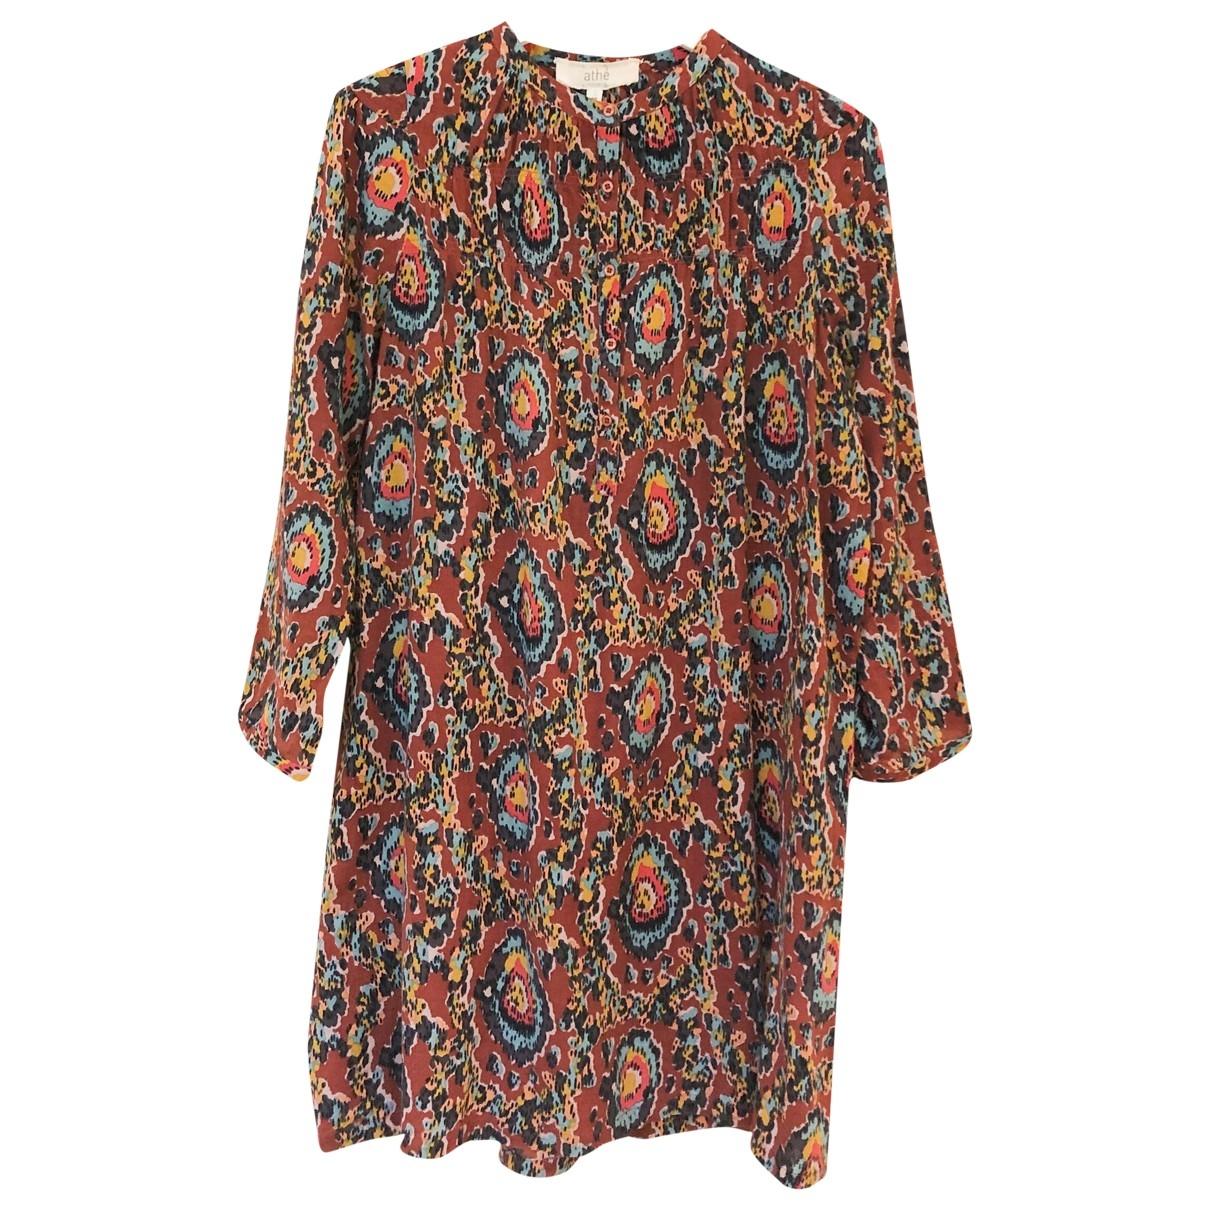 Vanessa Bruno Athe \N Burgundy Cotton dress for Women 38 FR